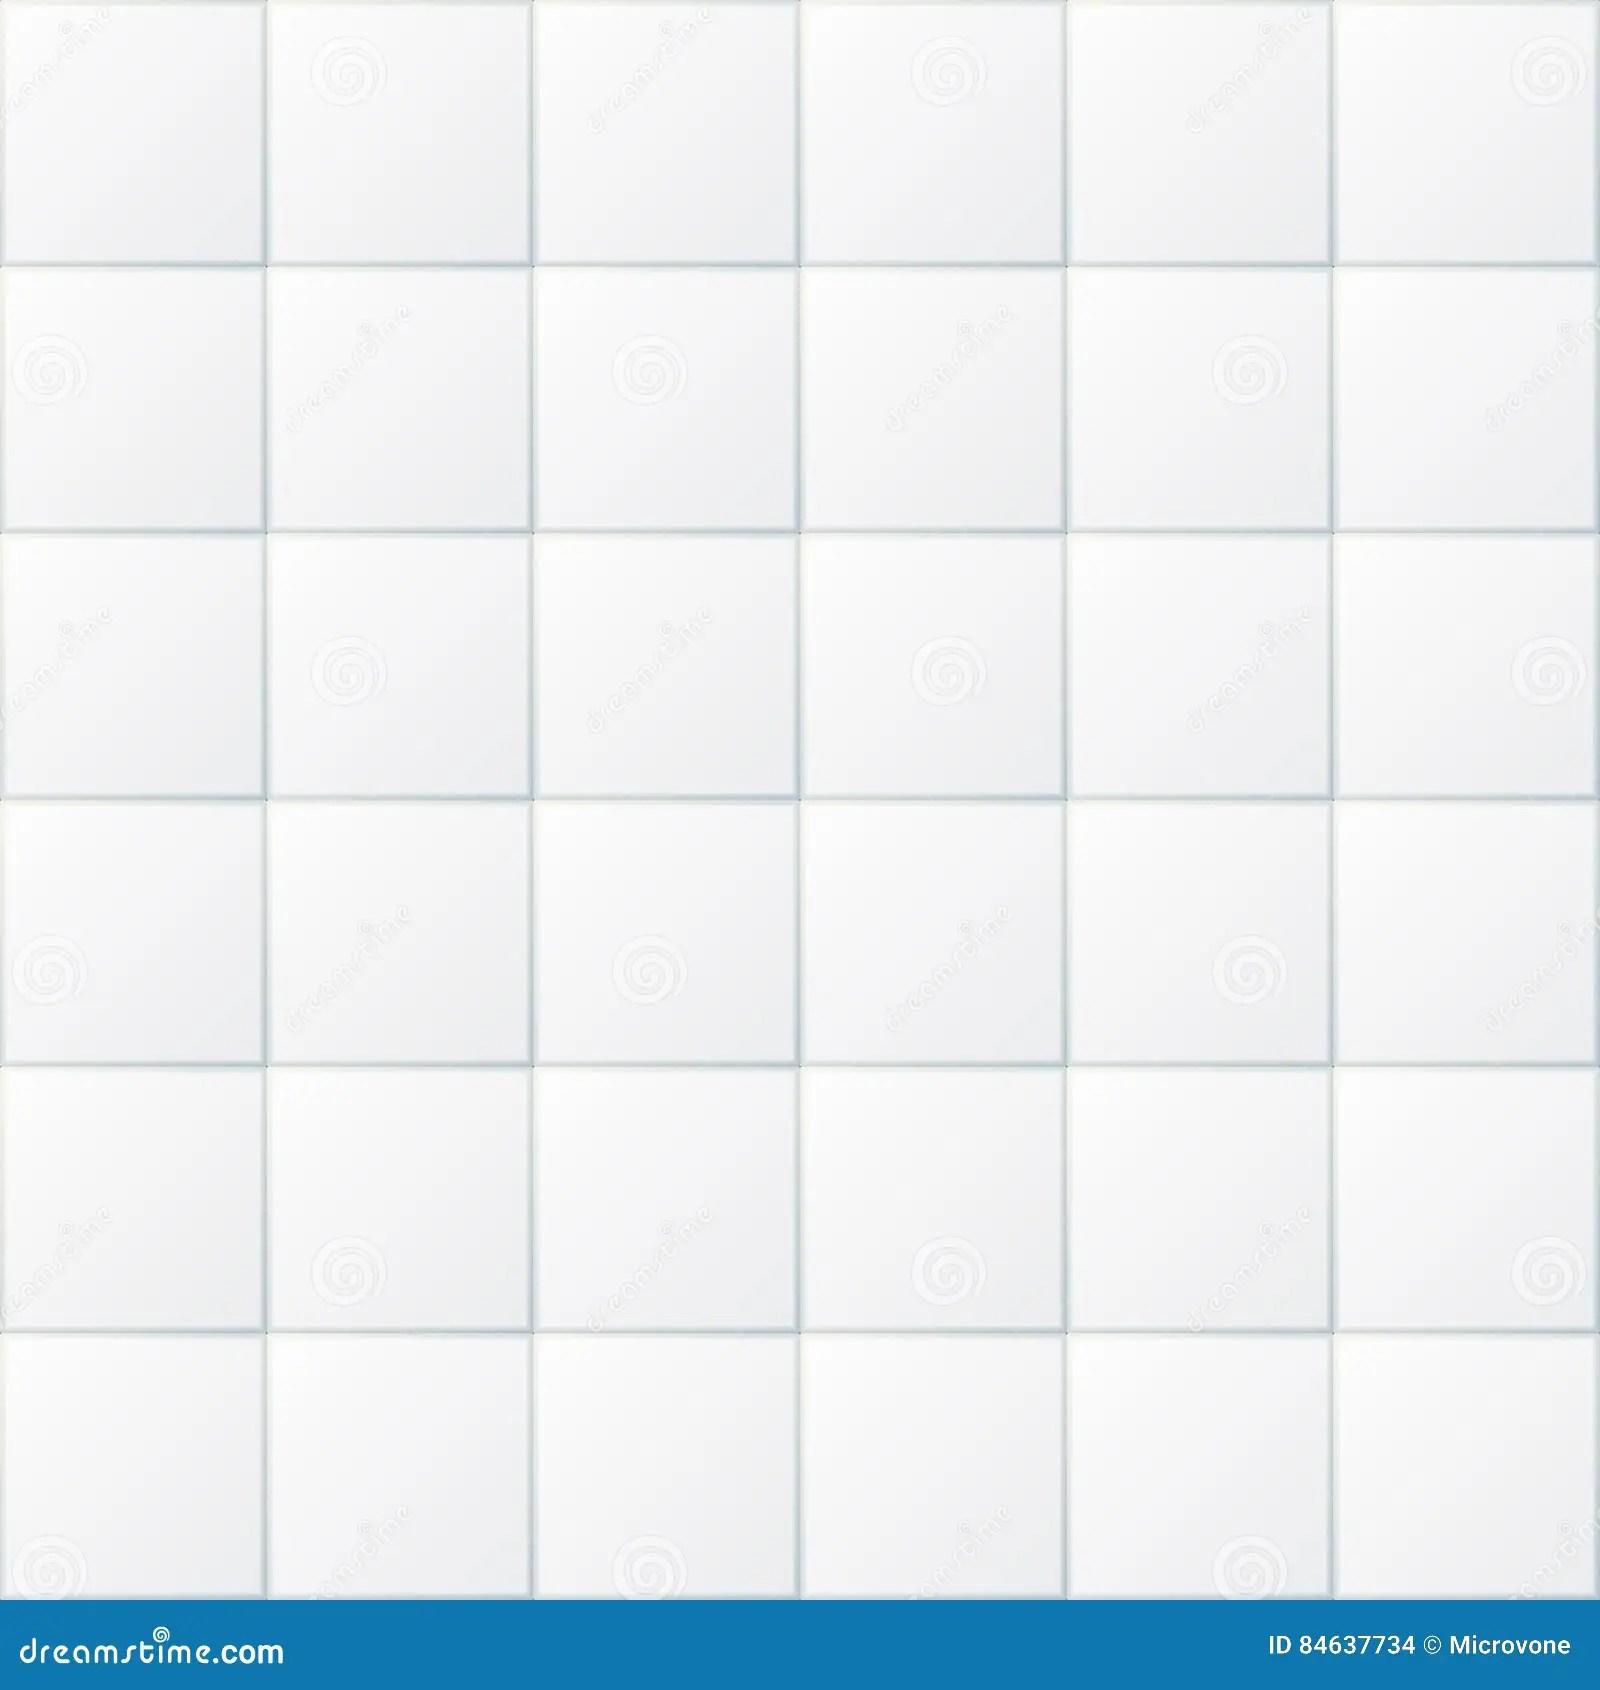 white bathroom tiles, ceramic kitchen floor seamless background